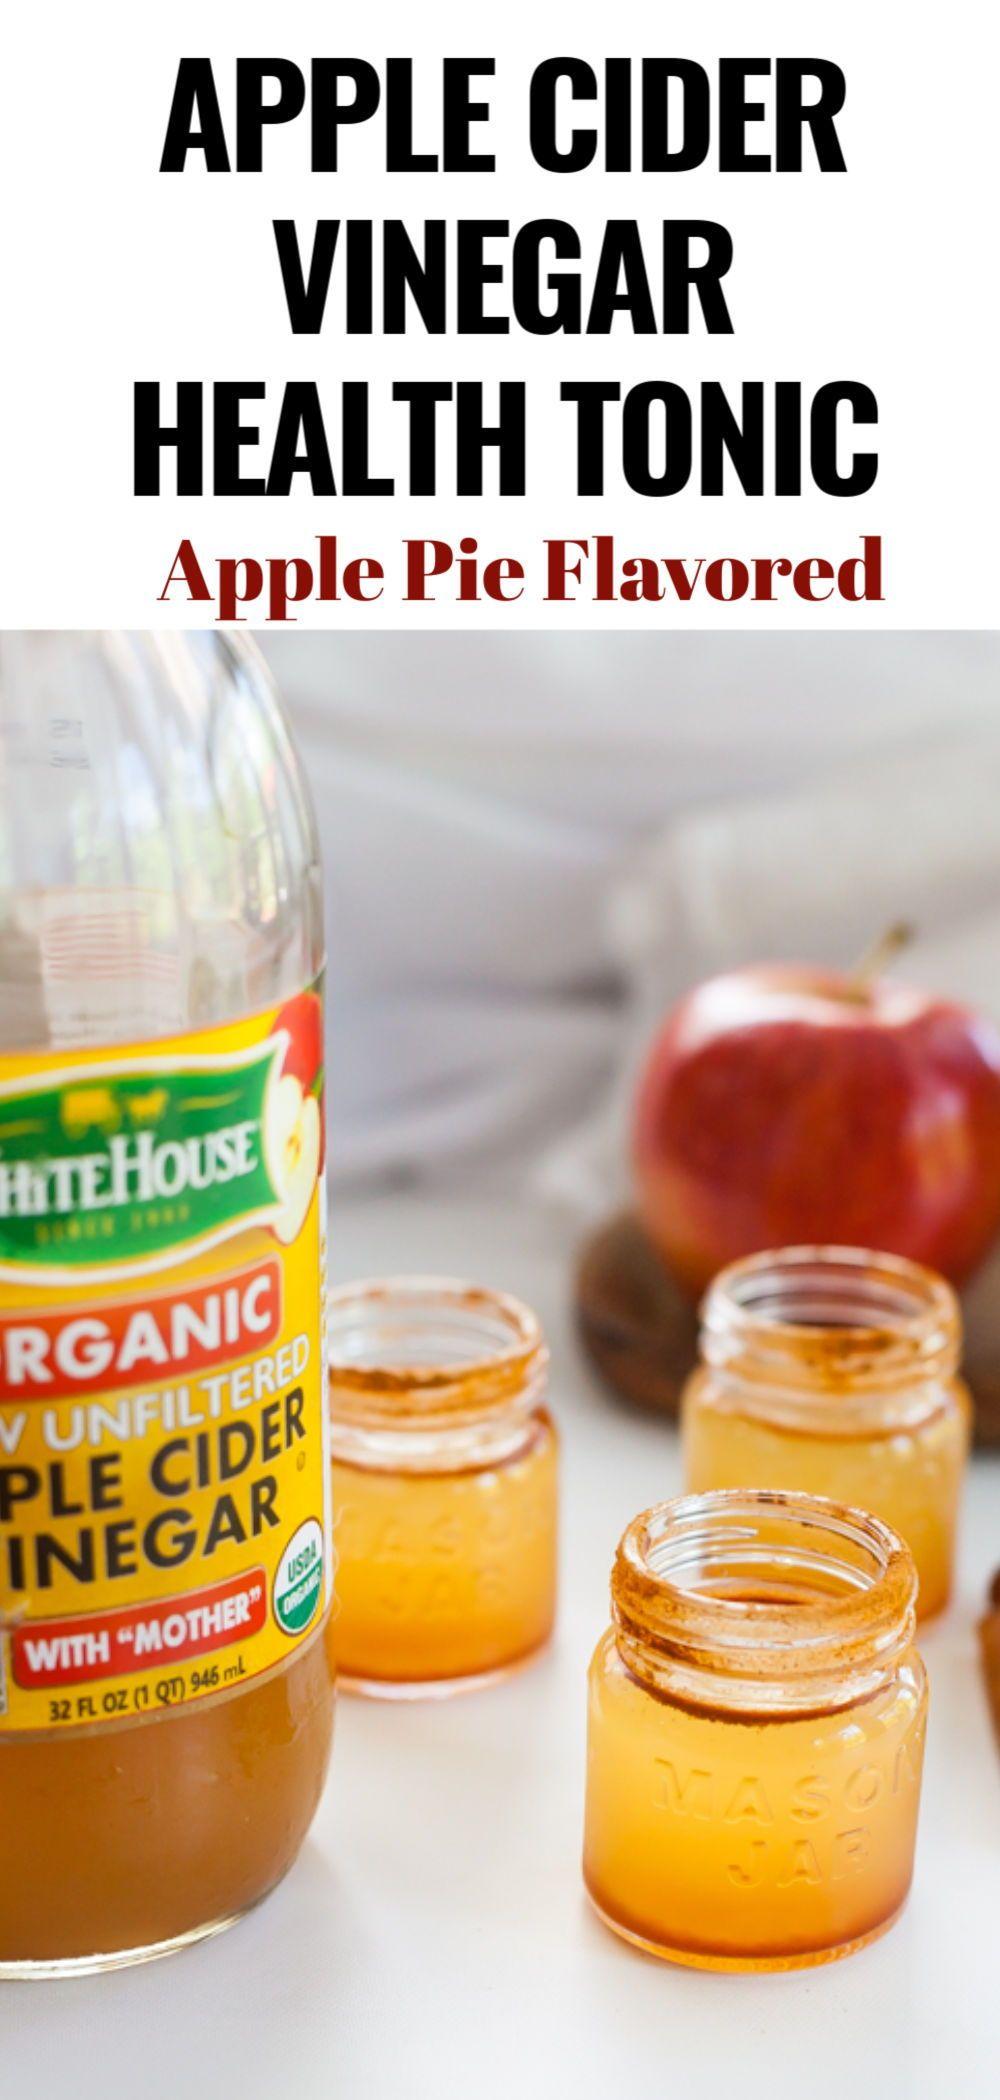 Apple Pie Flavor Apple Cider Vinegar Shot Fall Recipes Healthy Shot Recipes Healthy Dessert Recipes Easy